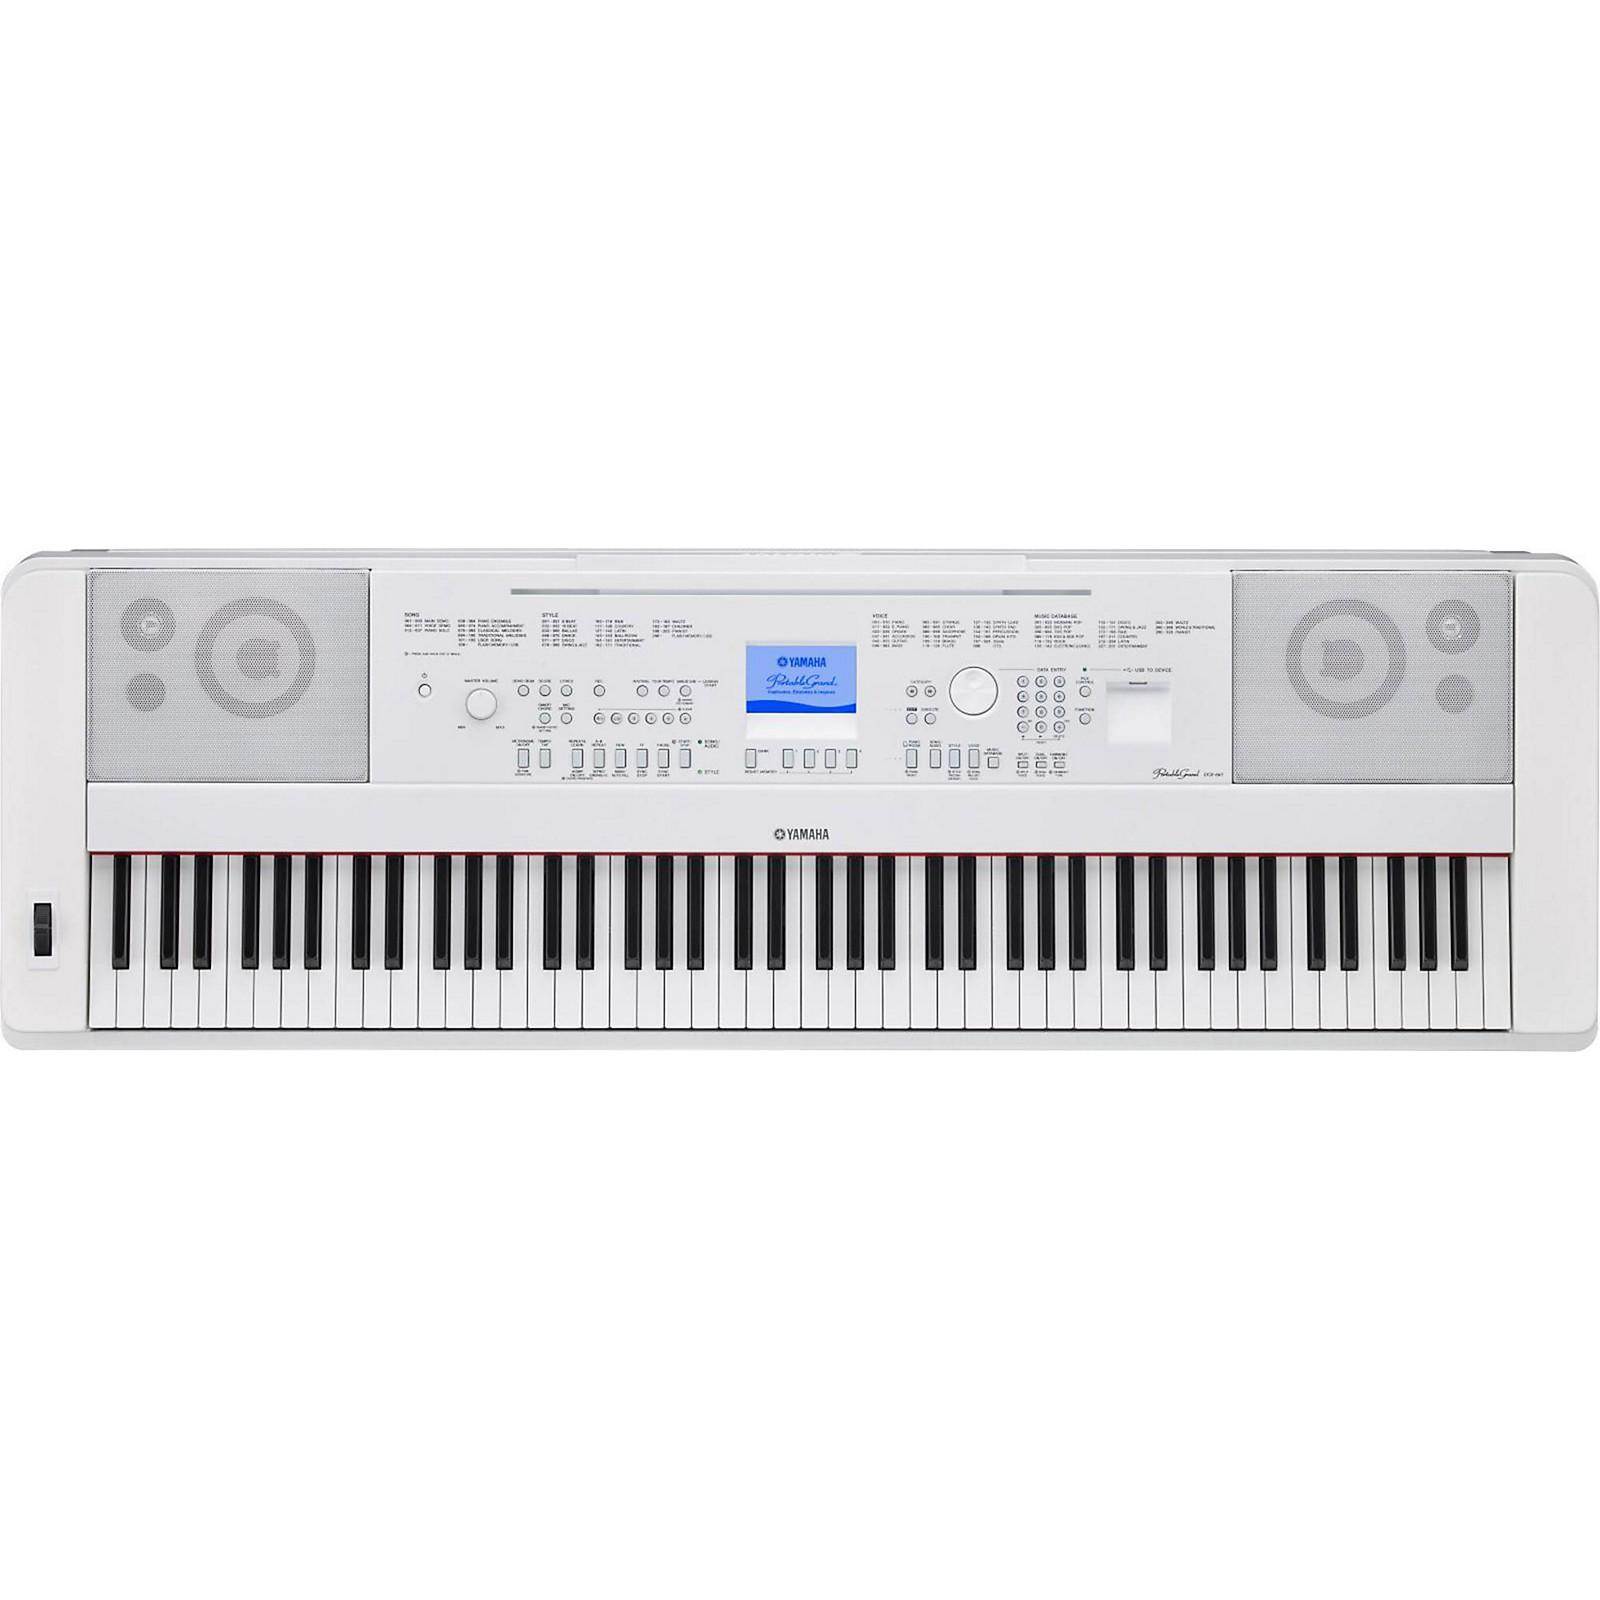 Yamaha DGX-660 88-Key Portable Grand